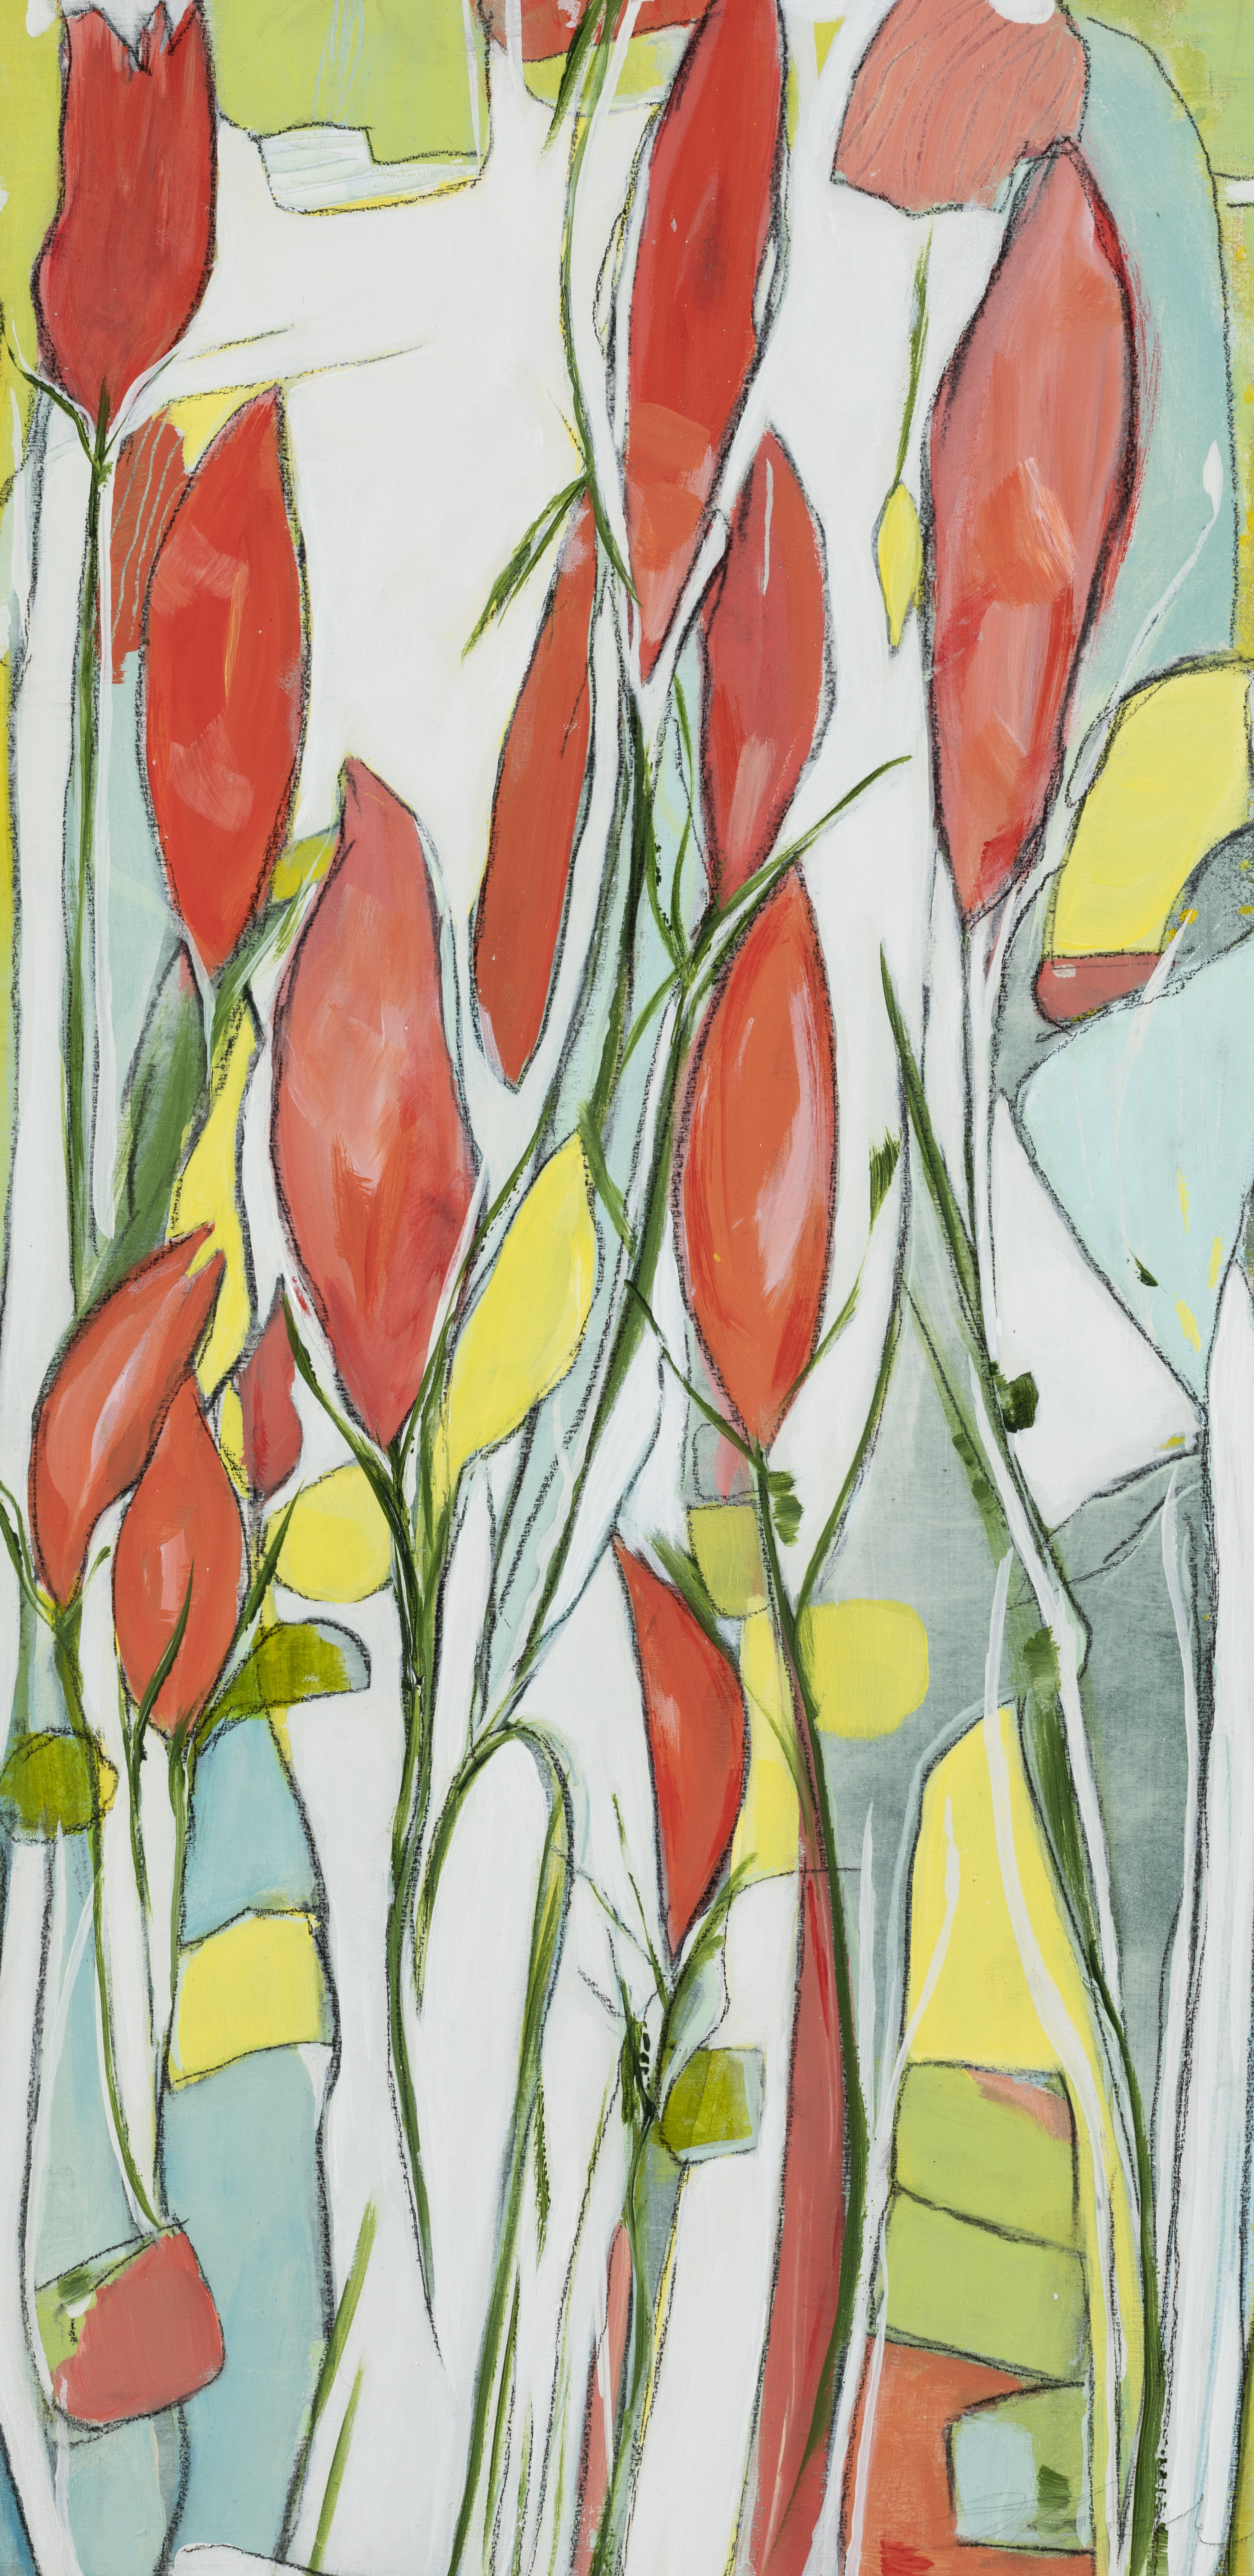 "Through The Gate - 25"" x 13"" x 1""Acrylic, pastel, panel, framed$450"